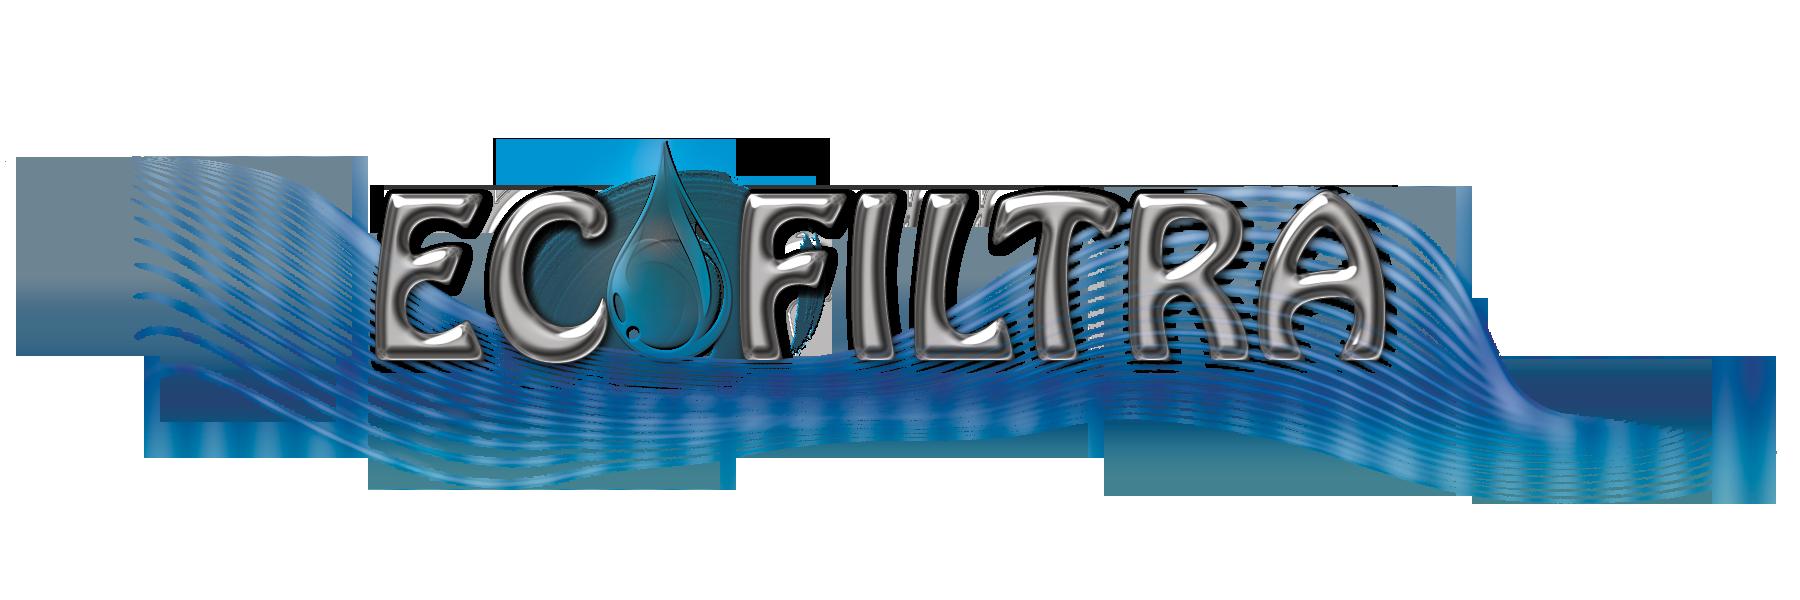 Ecofiltra